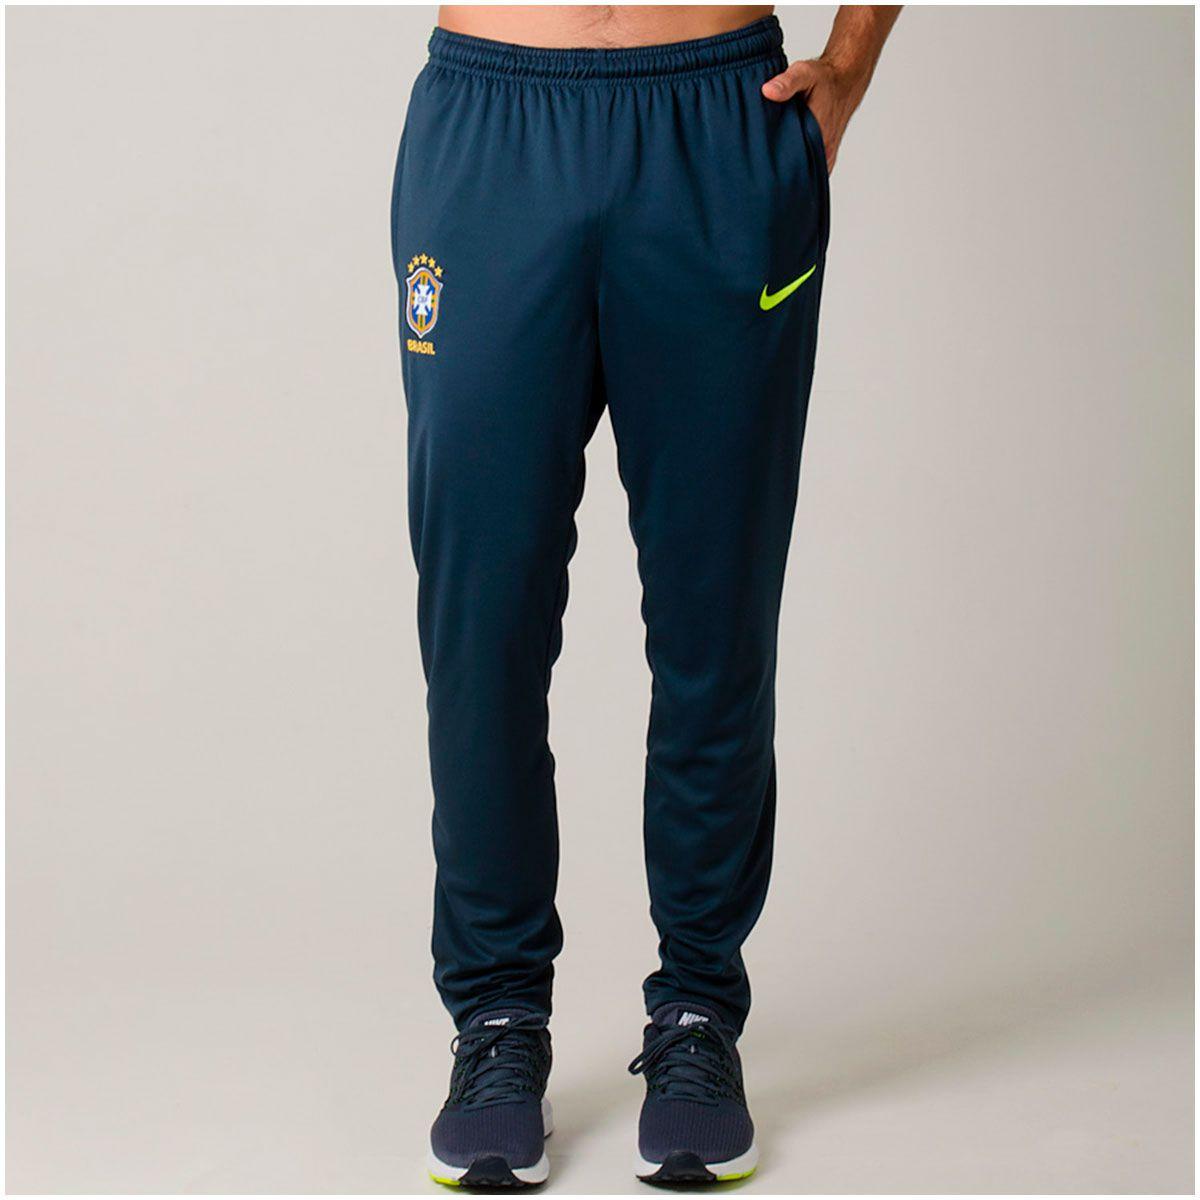 Agasalho Brasil Track Suit Nike 2018-19